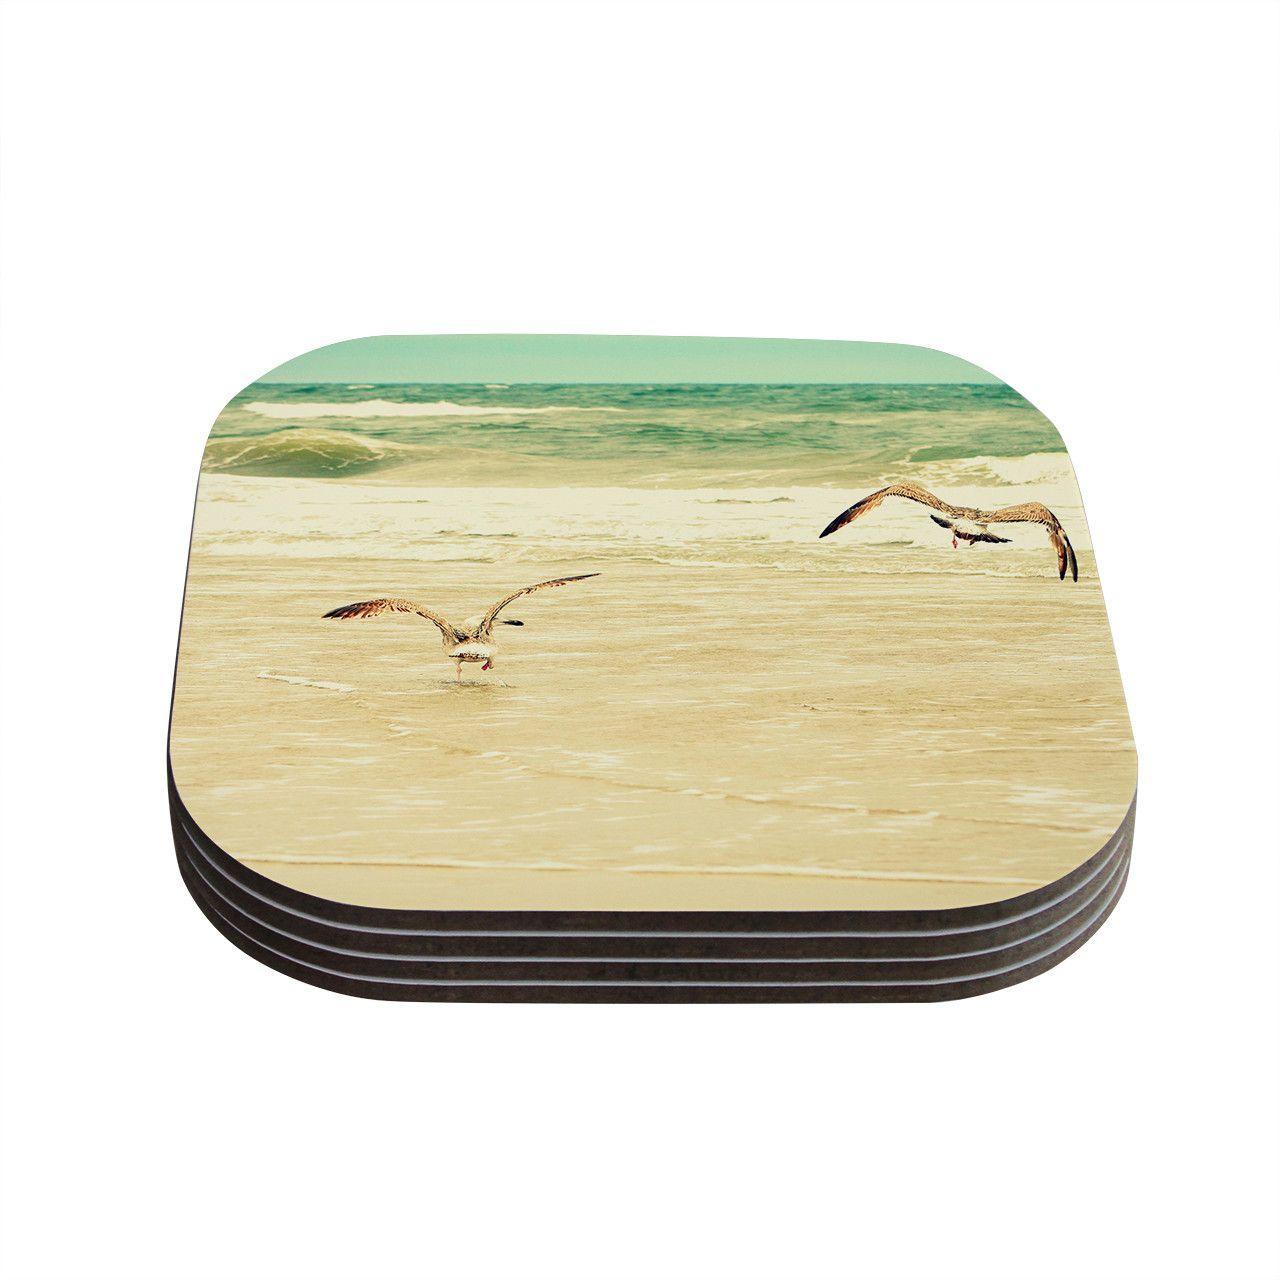 "Robin Dickinson ""Karate Kid Pose"" Art Object Coasters (Set of 4)"